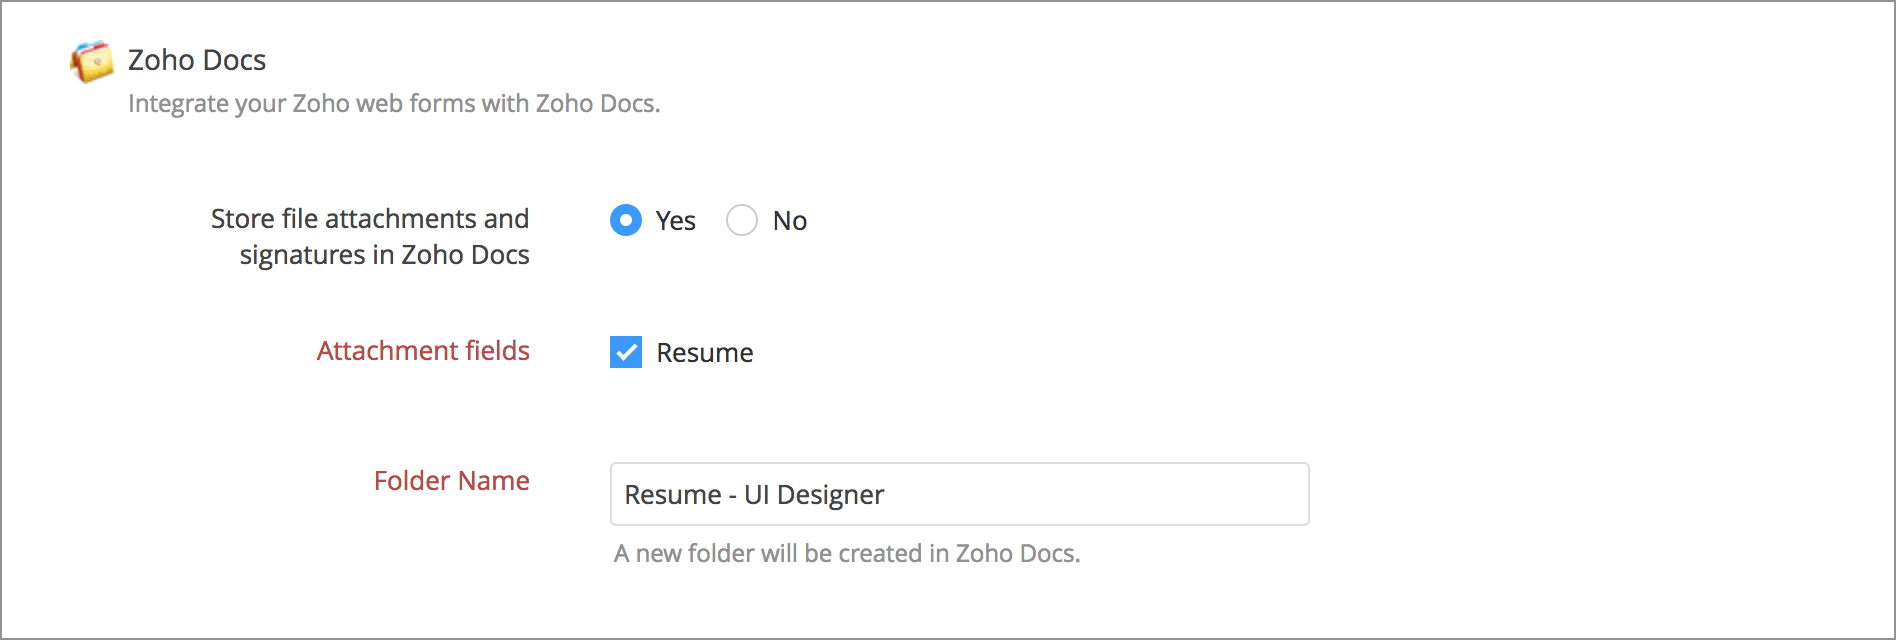 Zoho Spreadsheet Login intended for Zoho Sheet Integration  Zoho Forms  User Guide